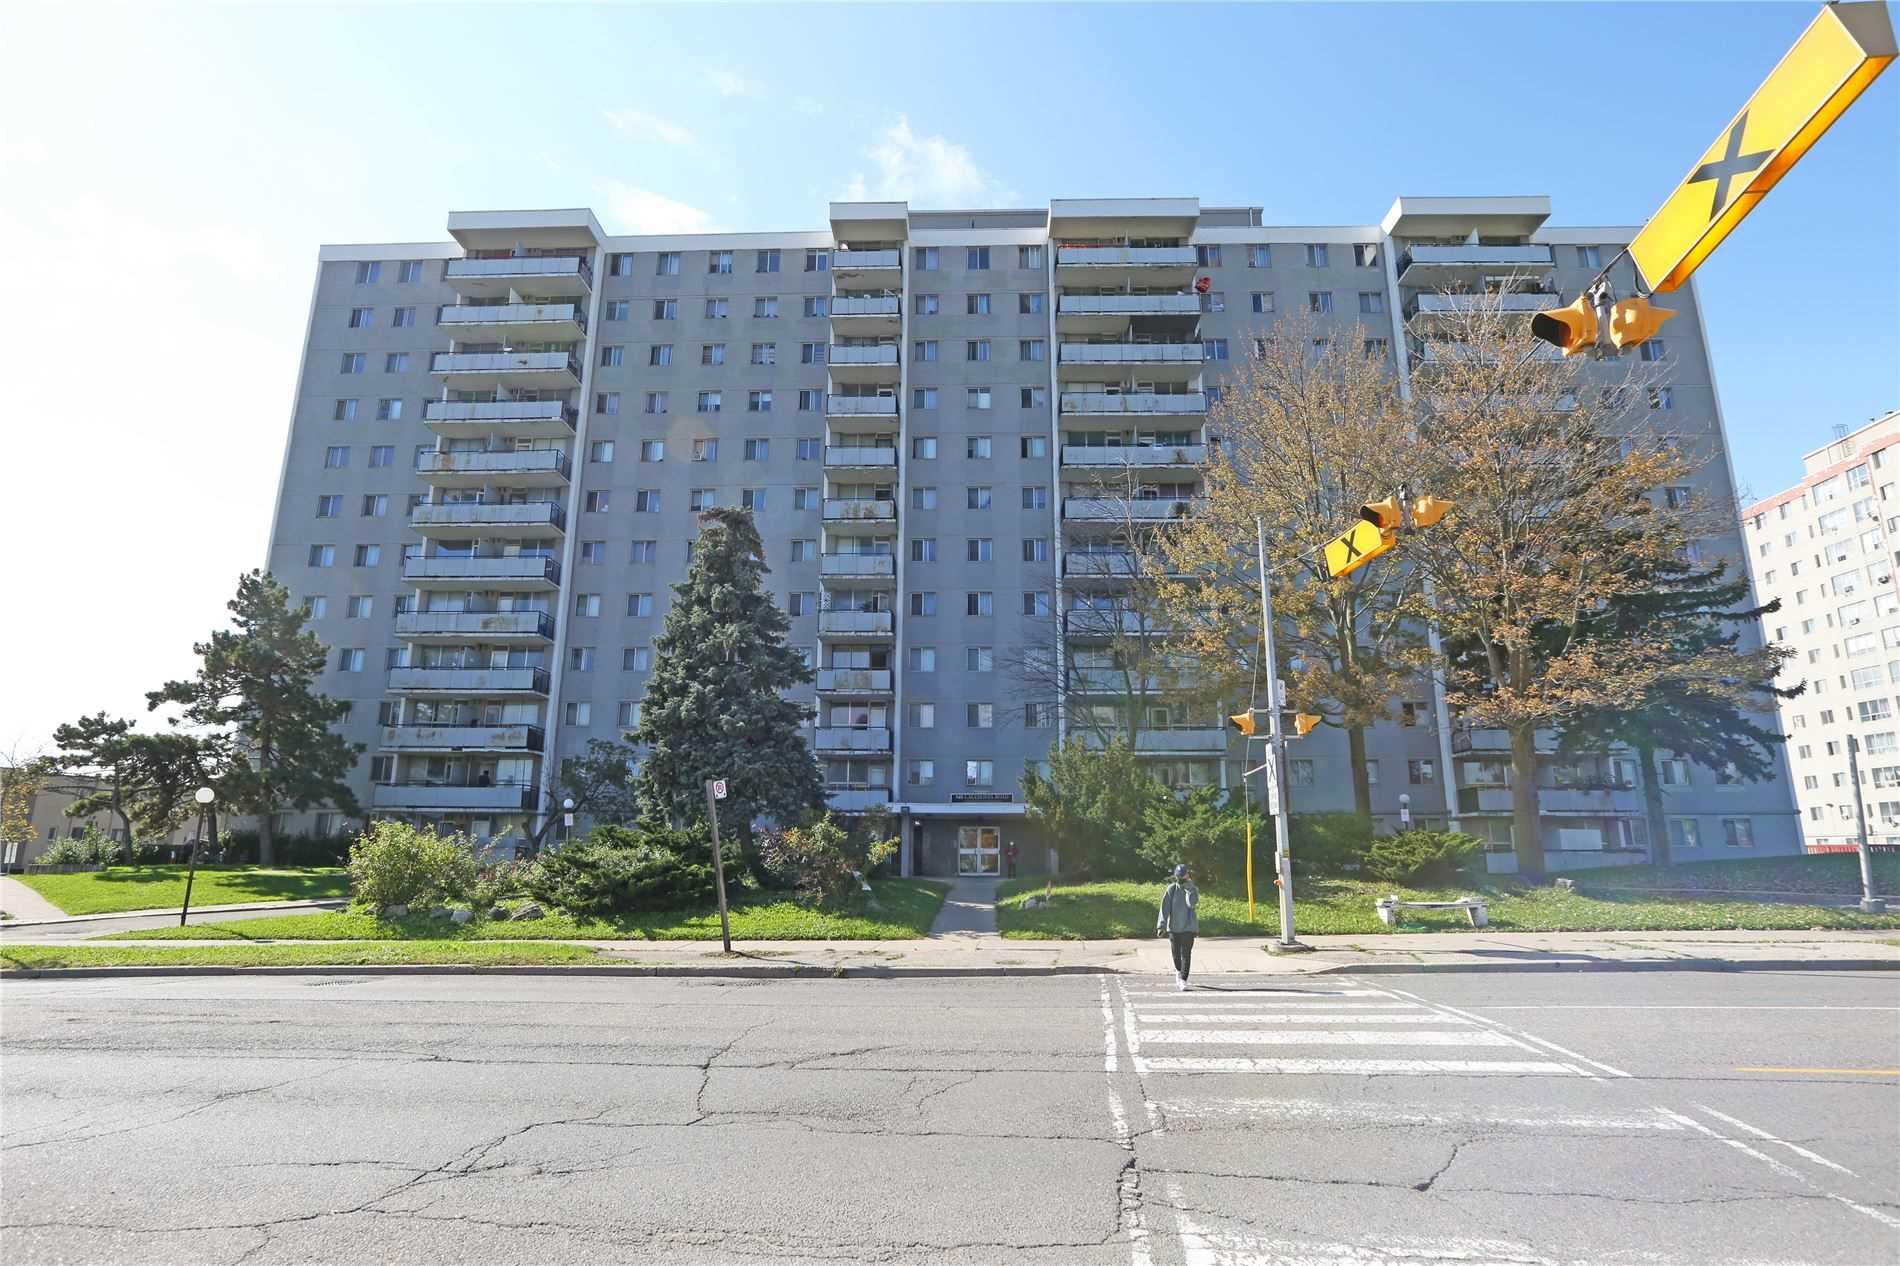 Condo Apt For Sale In Toronto , 2 Bedrooms Bedrooms, ,1 BathroomBathrooms,Condo Apt,For Sale,710,Caledonia